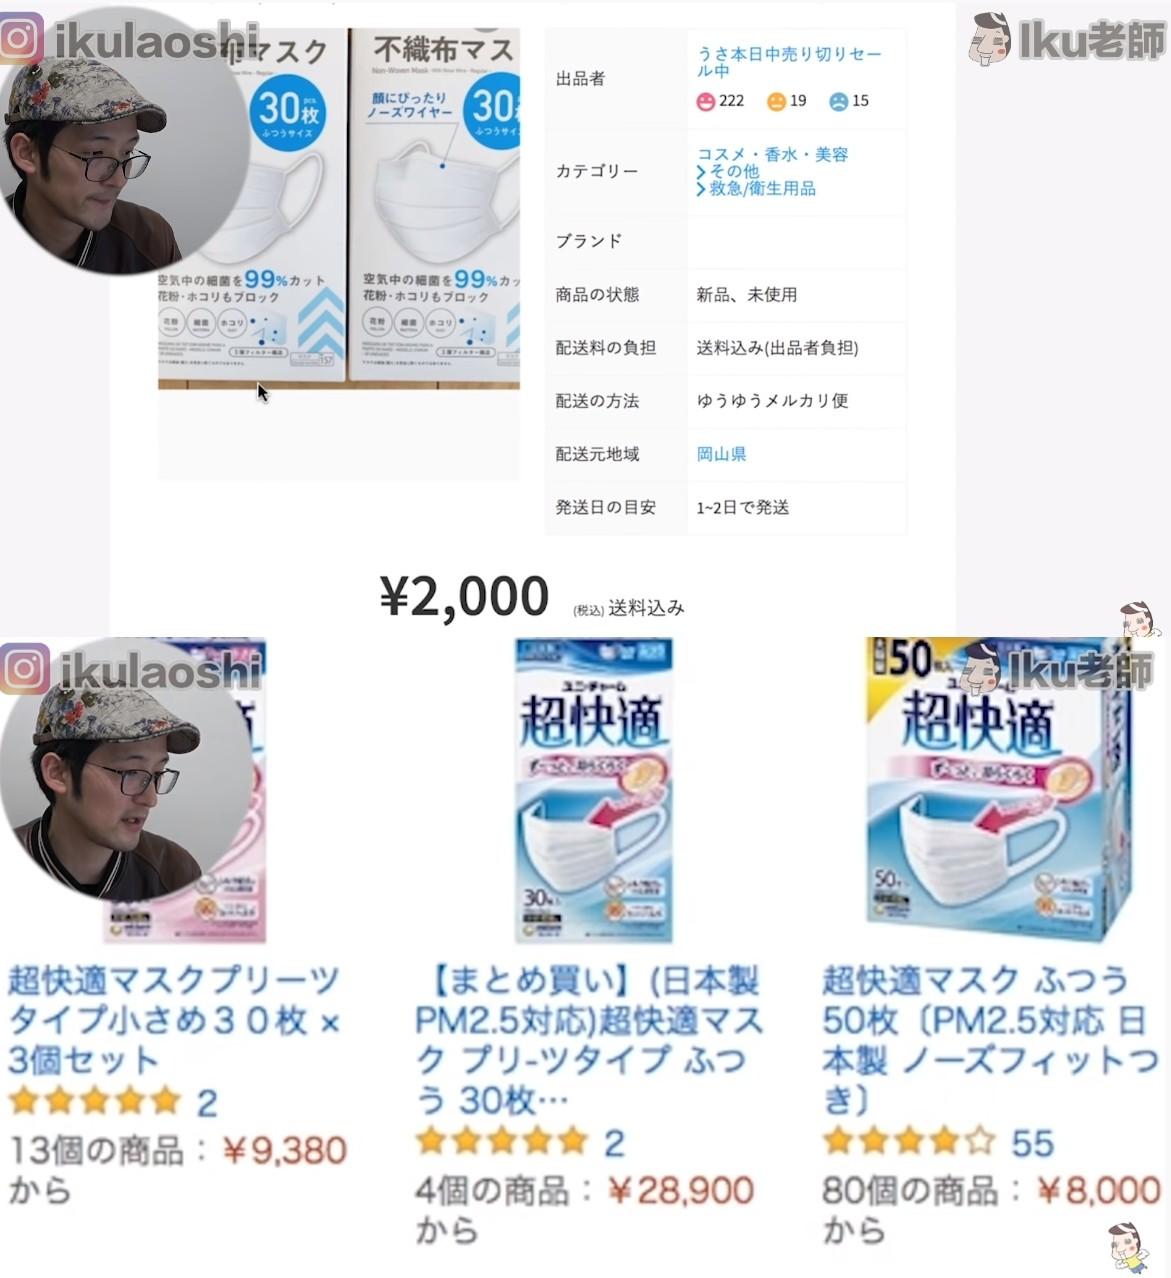 ▲Iku老師分享日網賣口罩的價格。(圖/翻攝自Iku老師/Ikulaoshi YouTube)